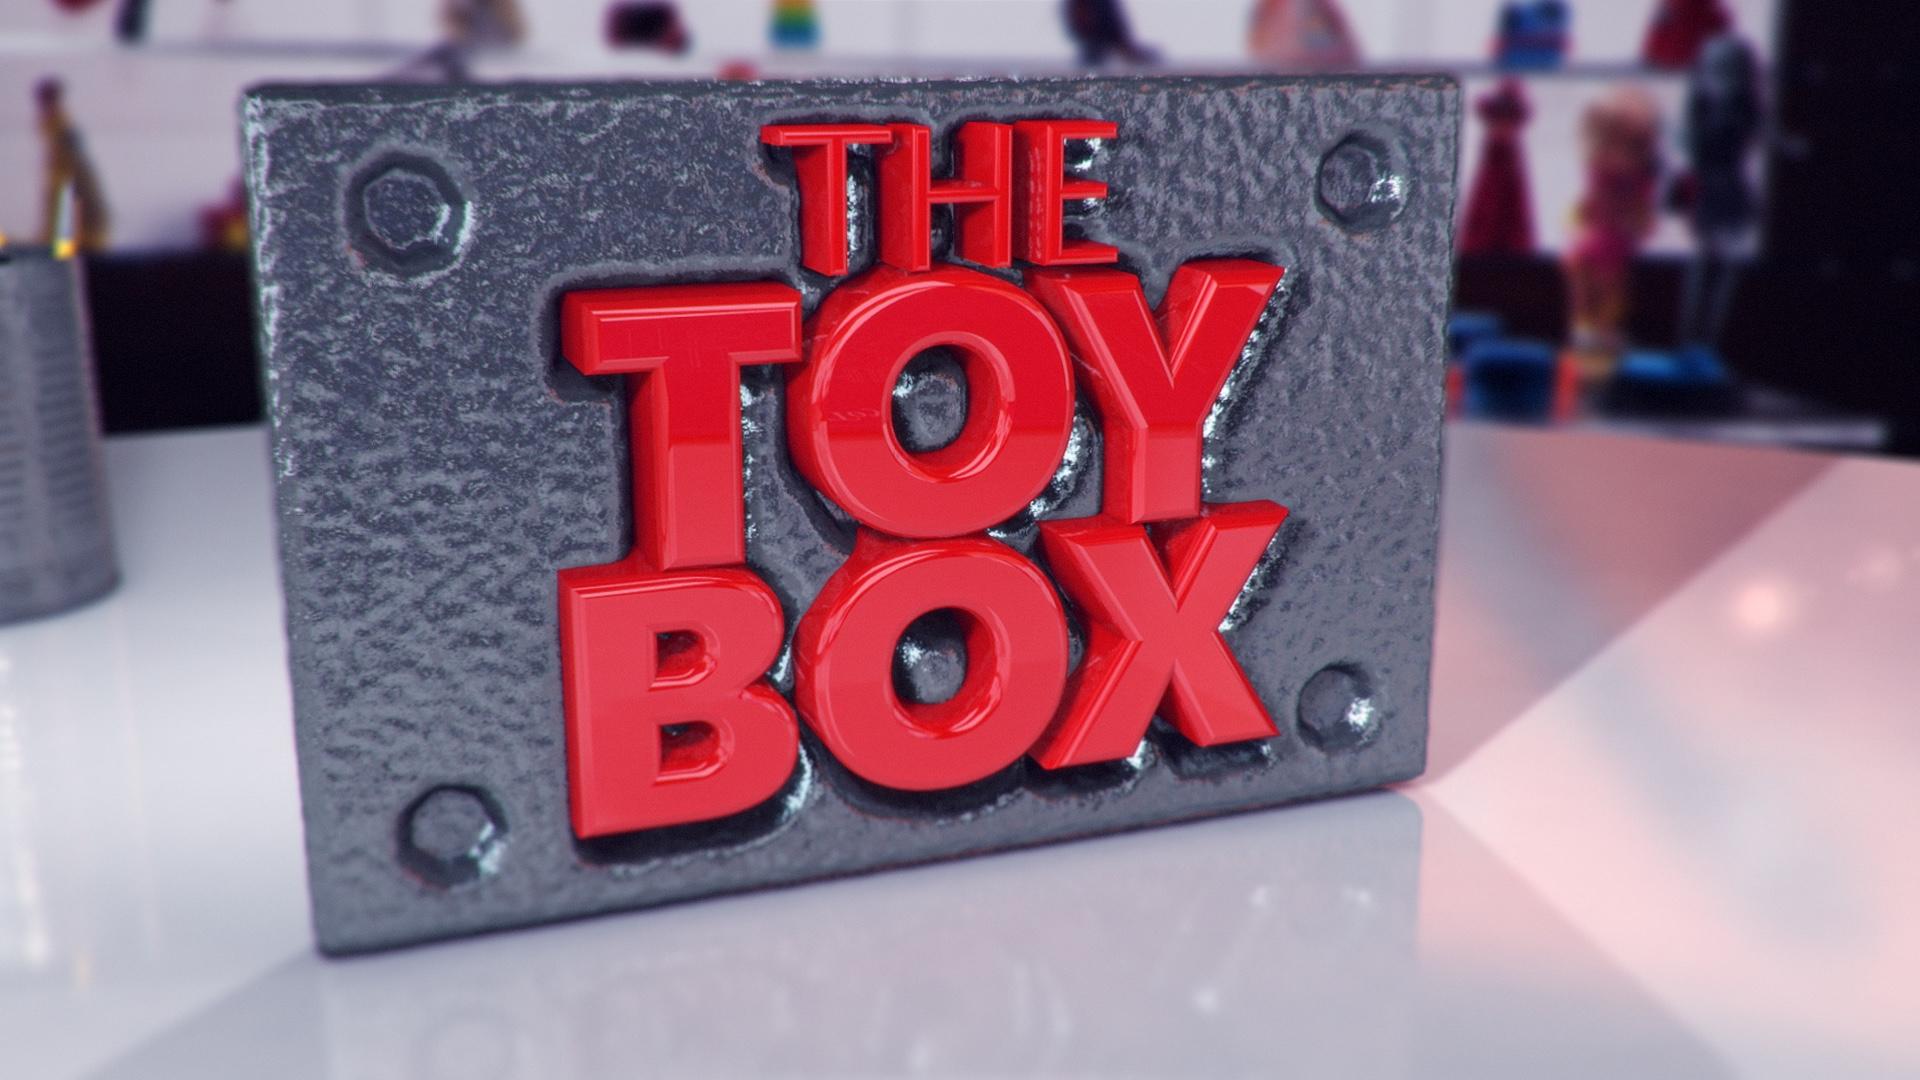 Seq_The_Toybox_Intro_Prores_v009_23.98_1080p (00150).jpg